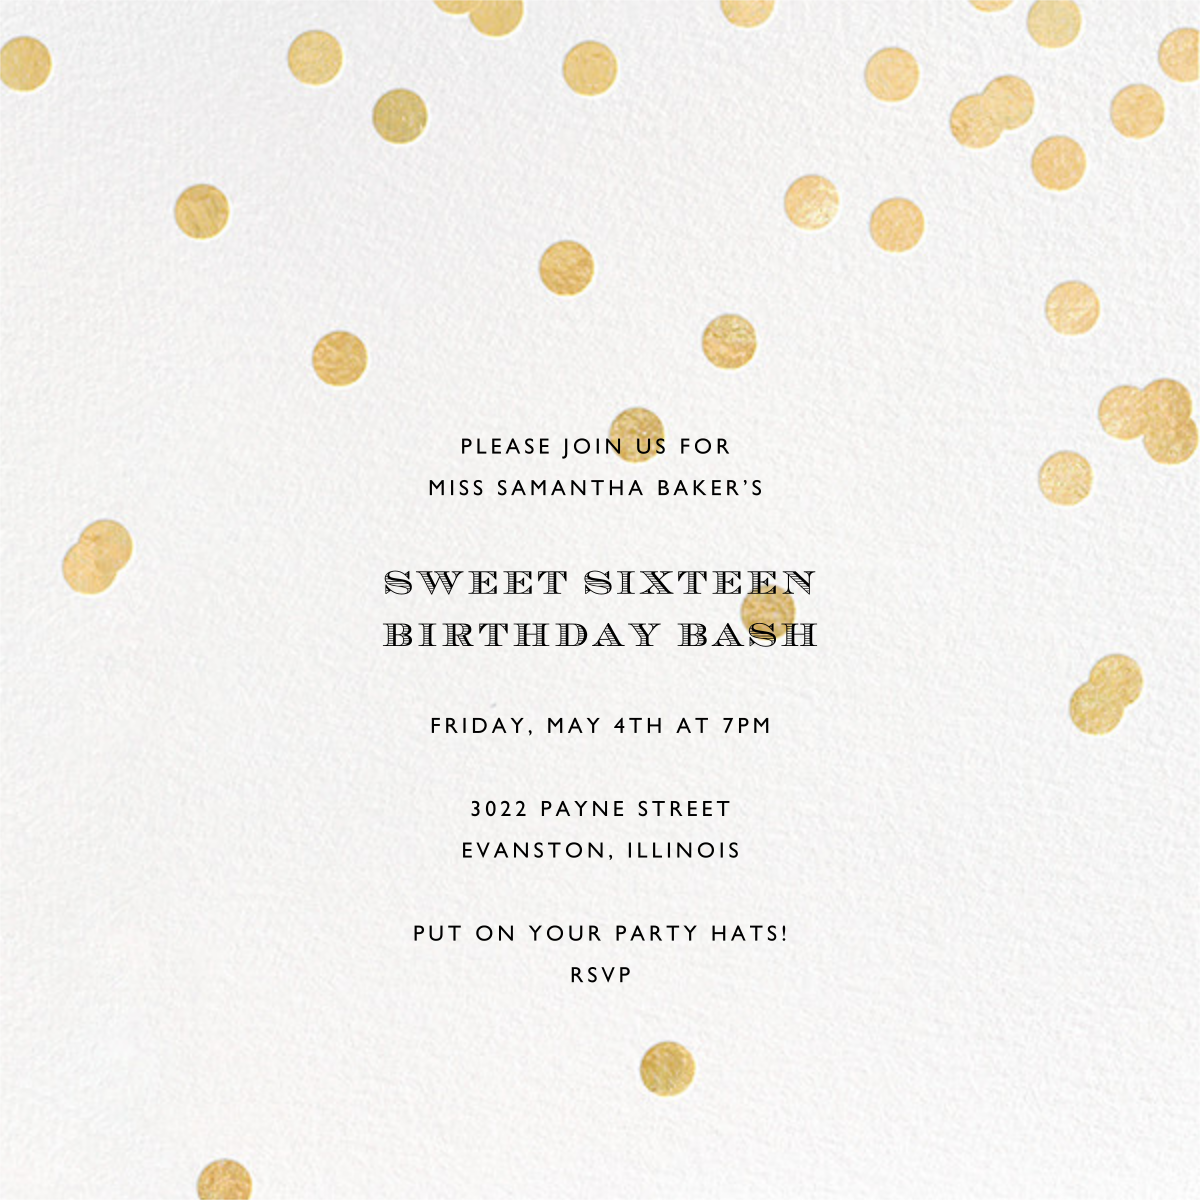 Come Celebrate - Ivory/Gold - kate spade new york - Birthday